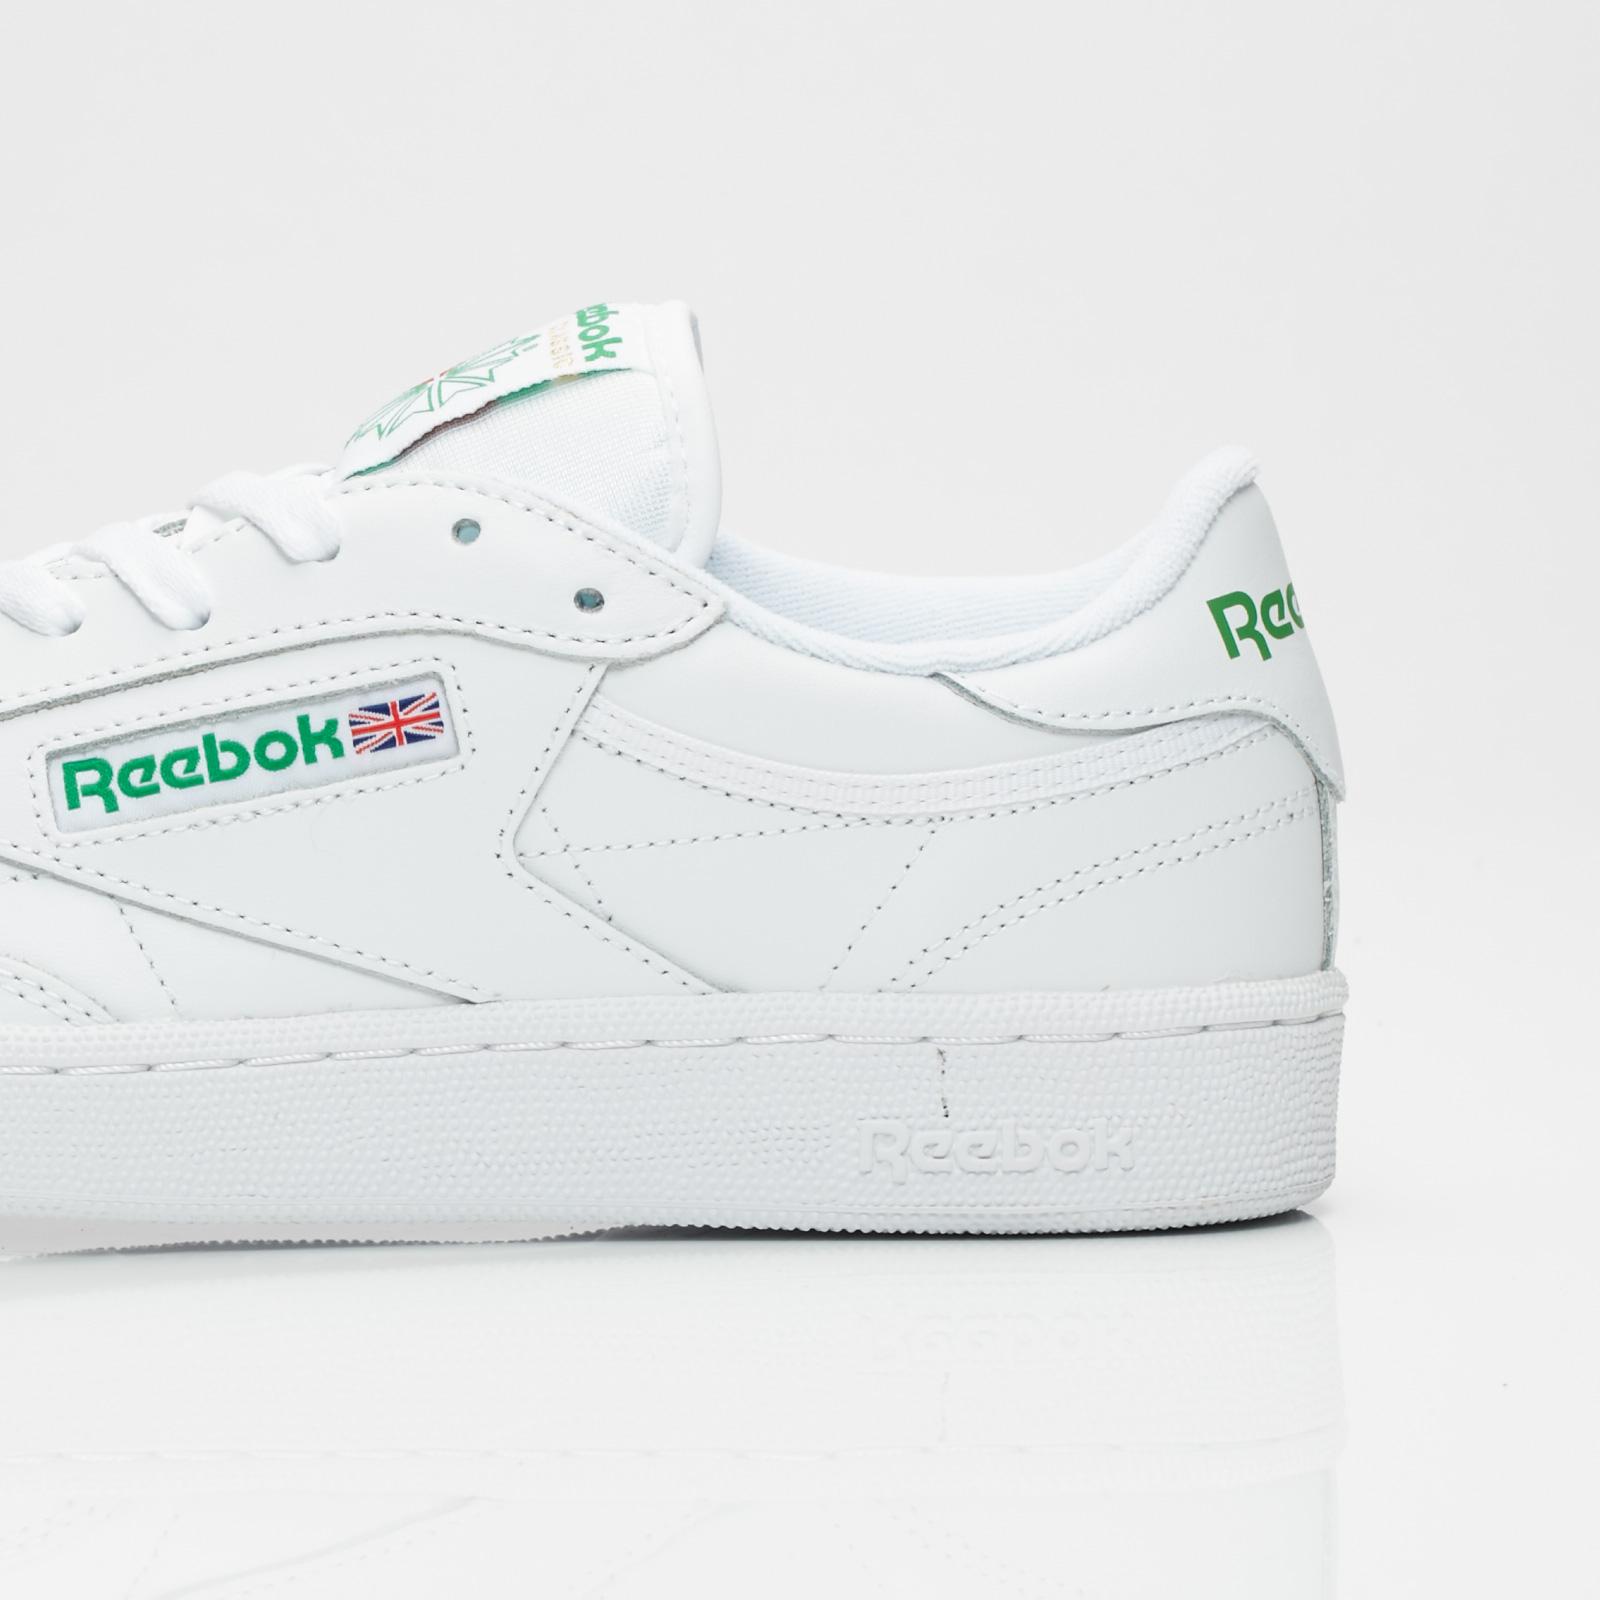 795c540c380 Reebok Club C 85 - Ar0456 - Sneakersnstuff